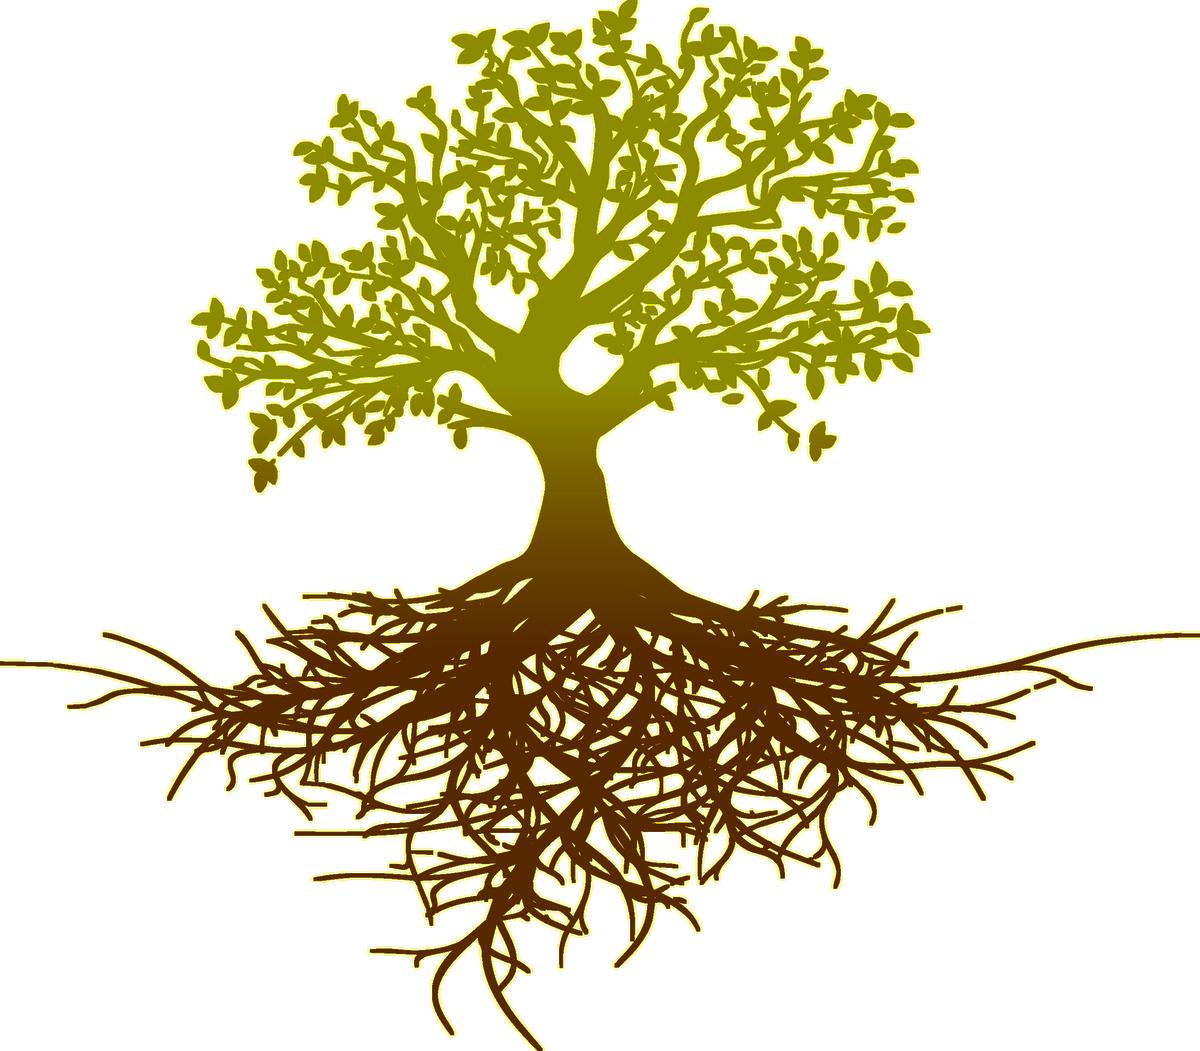 Root system tree oak thinking 1e3fdbaa0b3bc59ffe553e6f7386f154 1